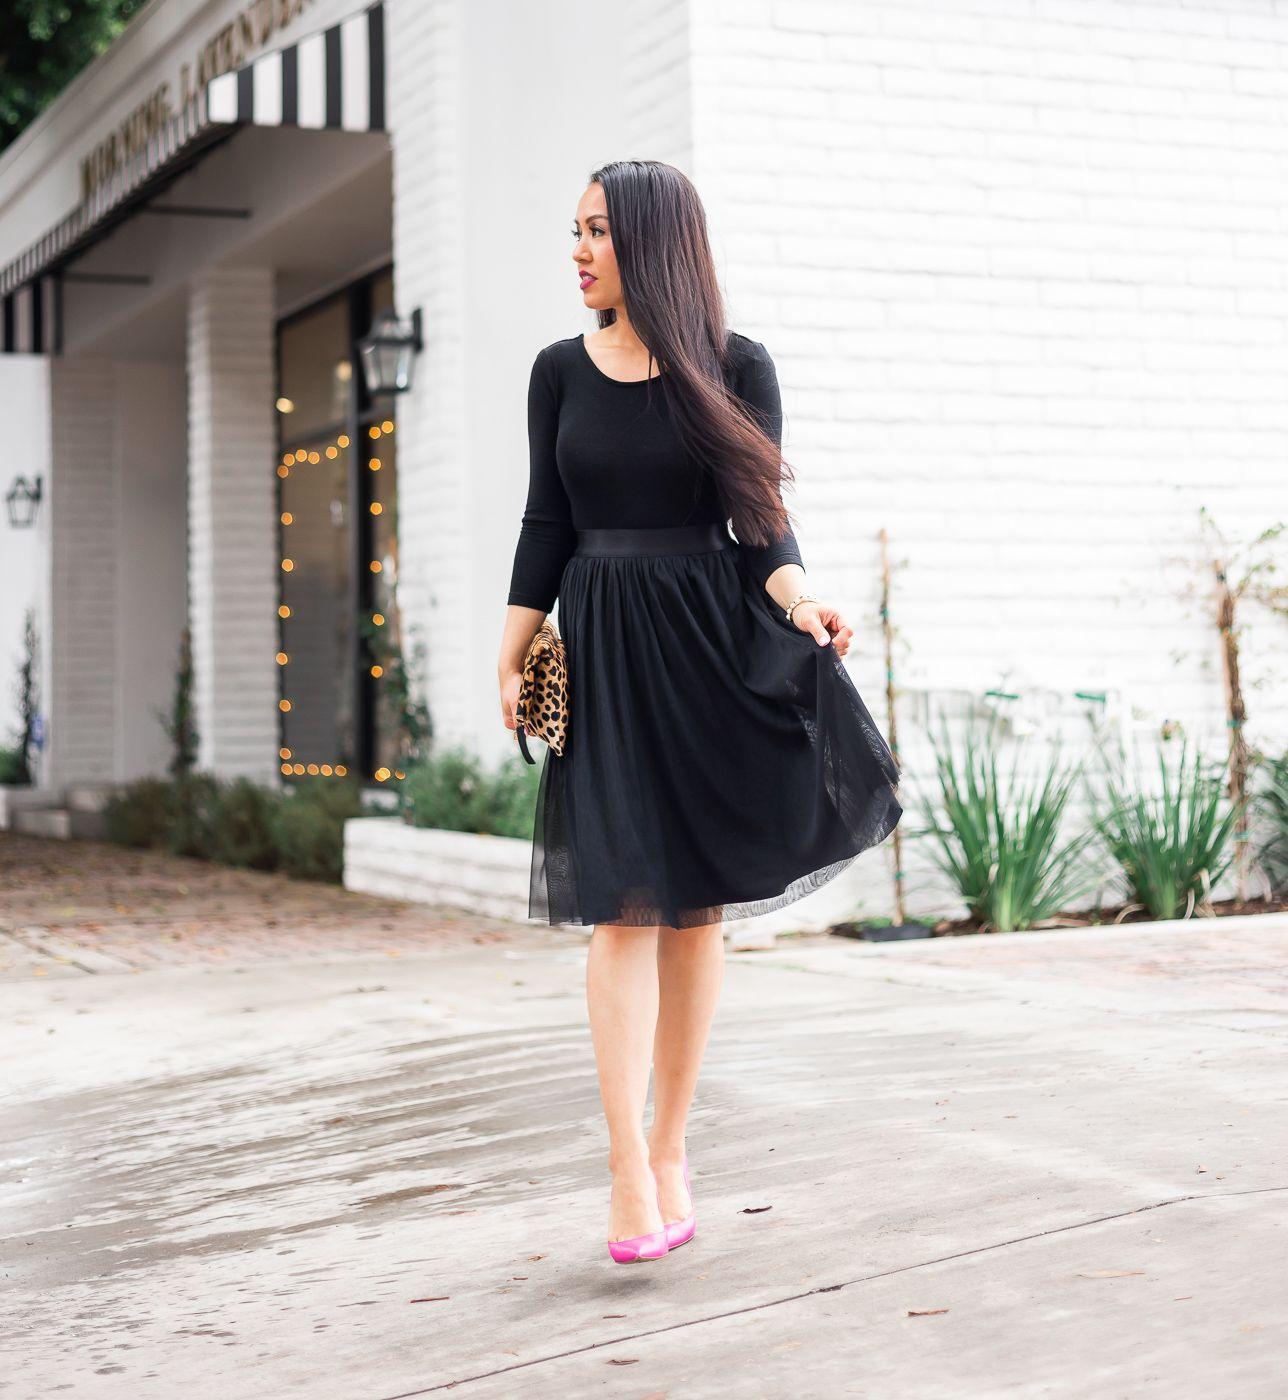 Black Tulle Skirt Dress Leopard Clutch Pink Pumps Stylish Petite Black Tulle Dress Tulle Skirt Black Tulle Skirt Dress [ 1400 x 1288 Pixel ]